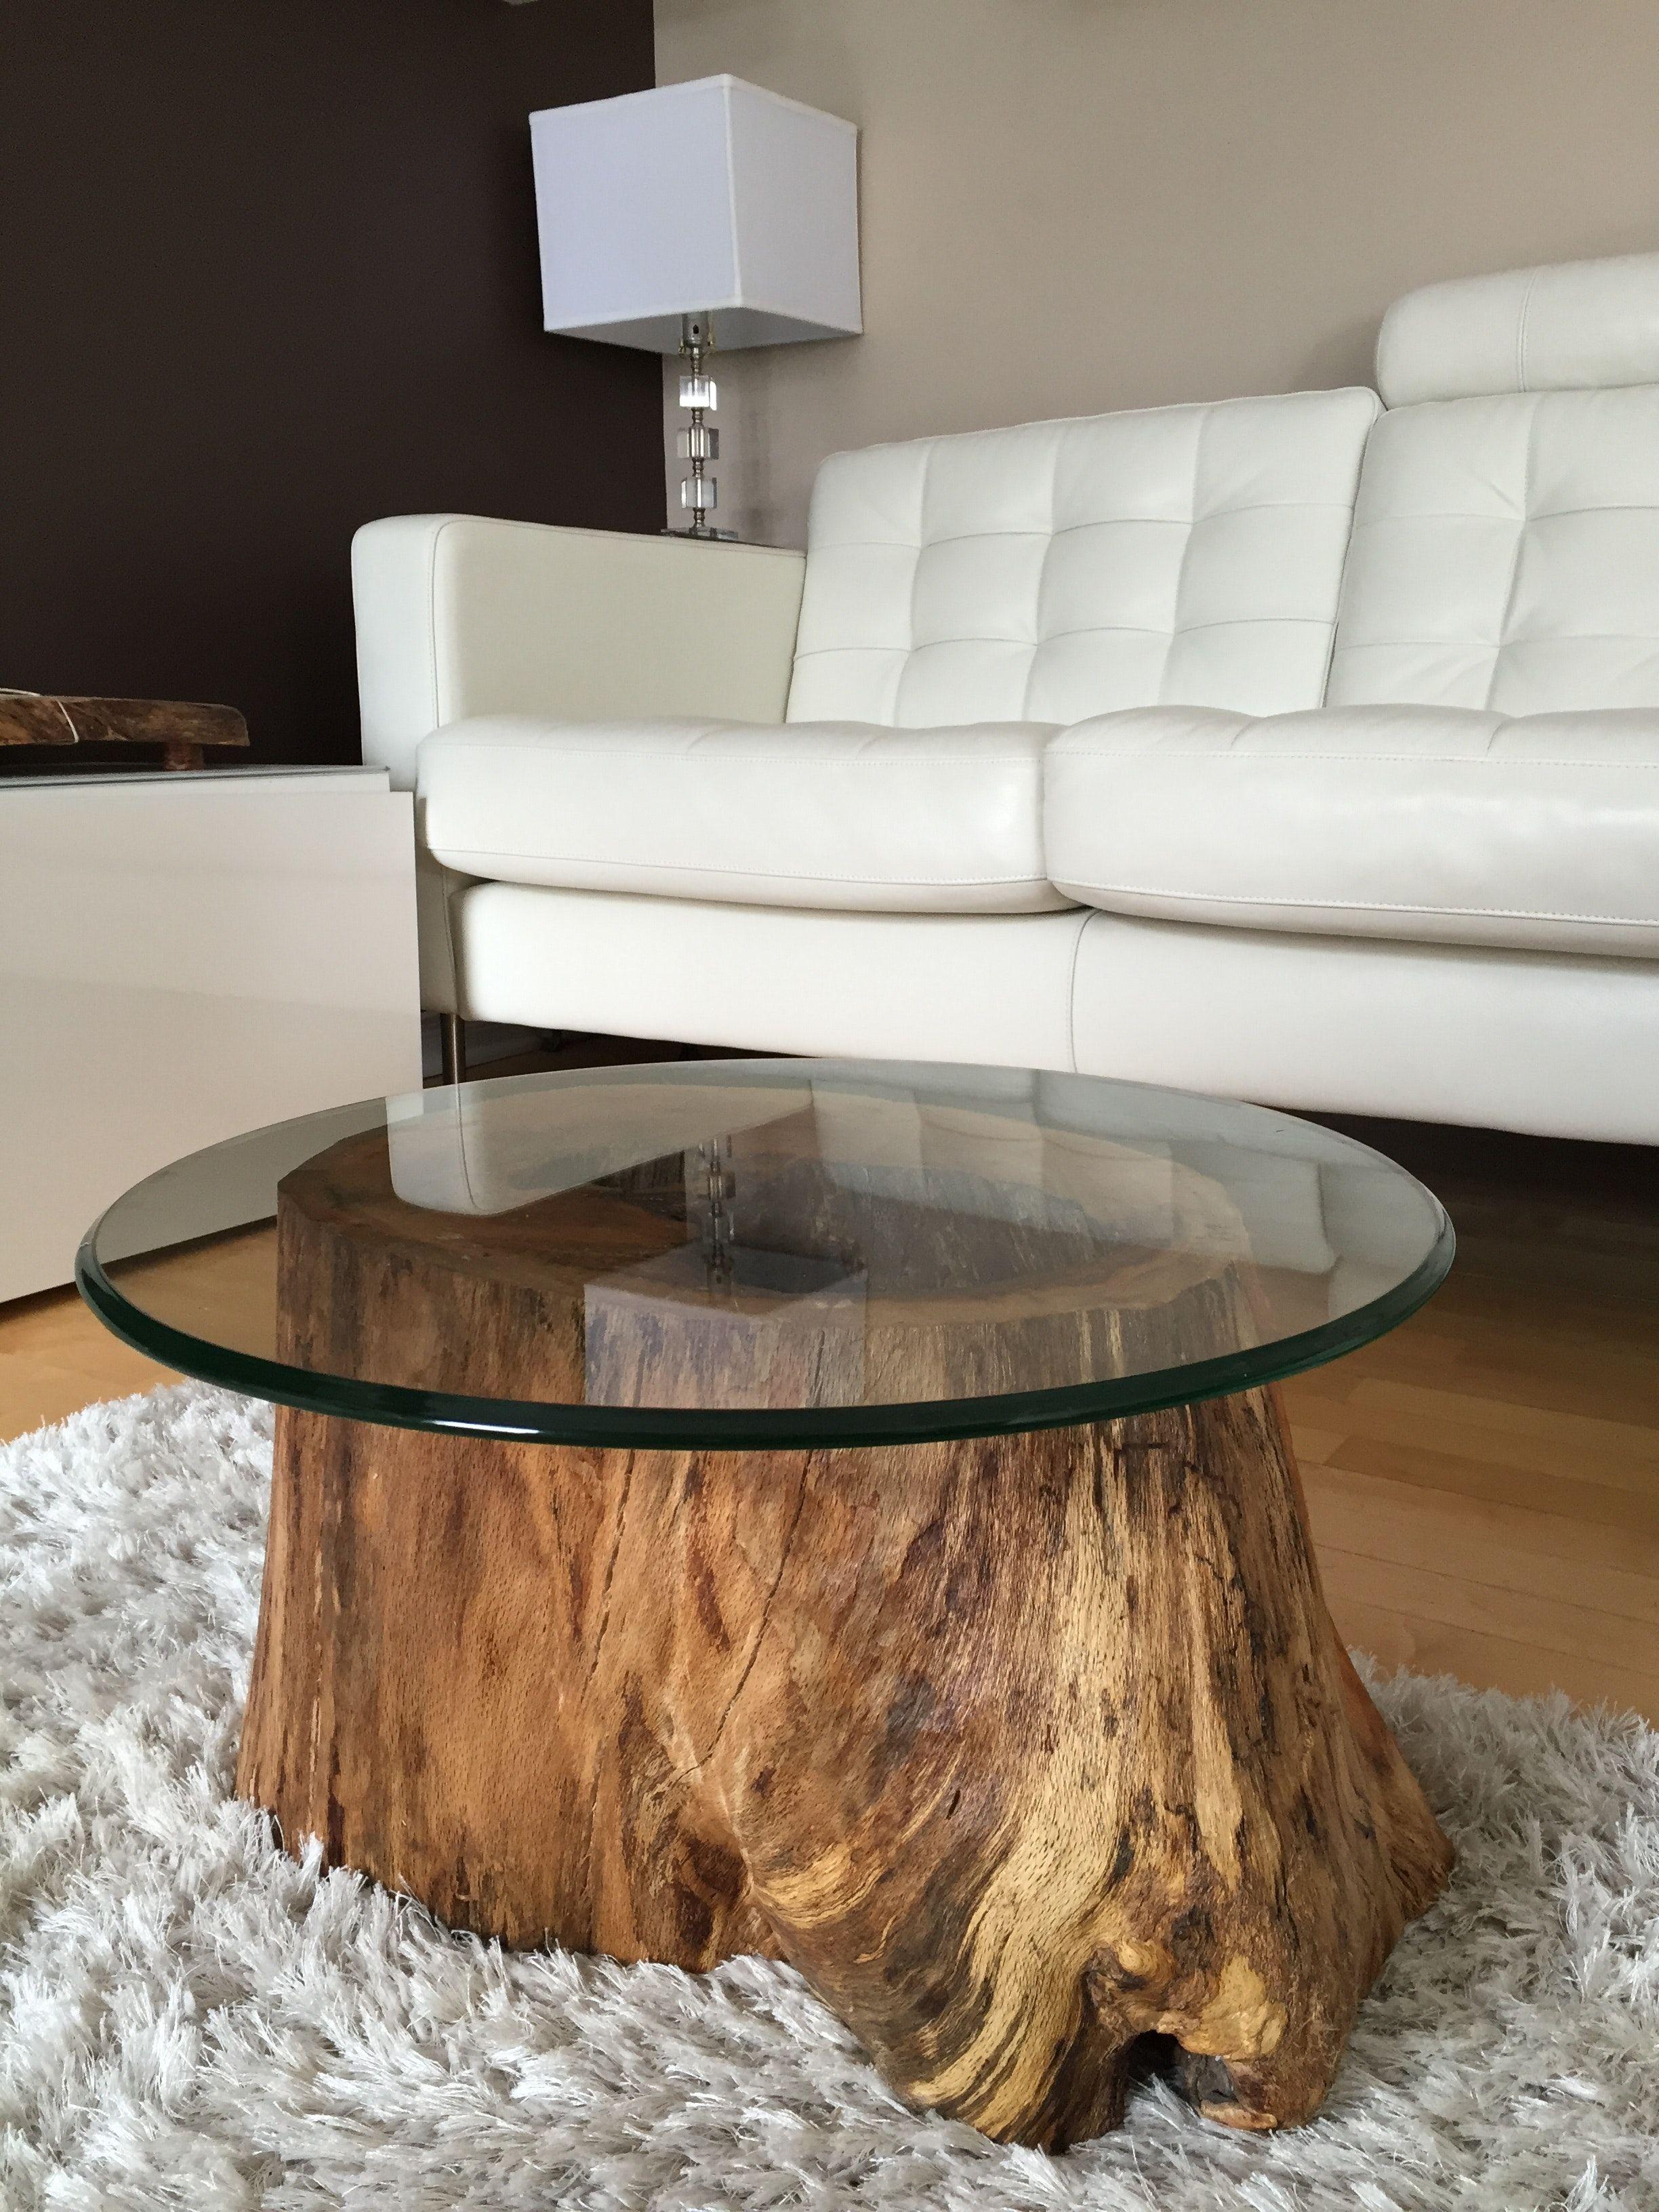 Grau Kaffee Tisch Holz Wurzel Tabelle Baumstumpf Tischplatte